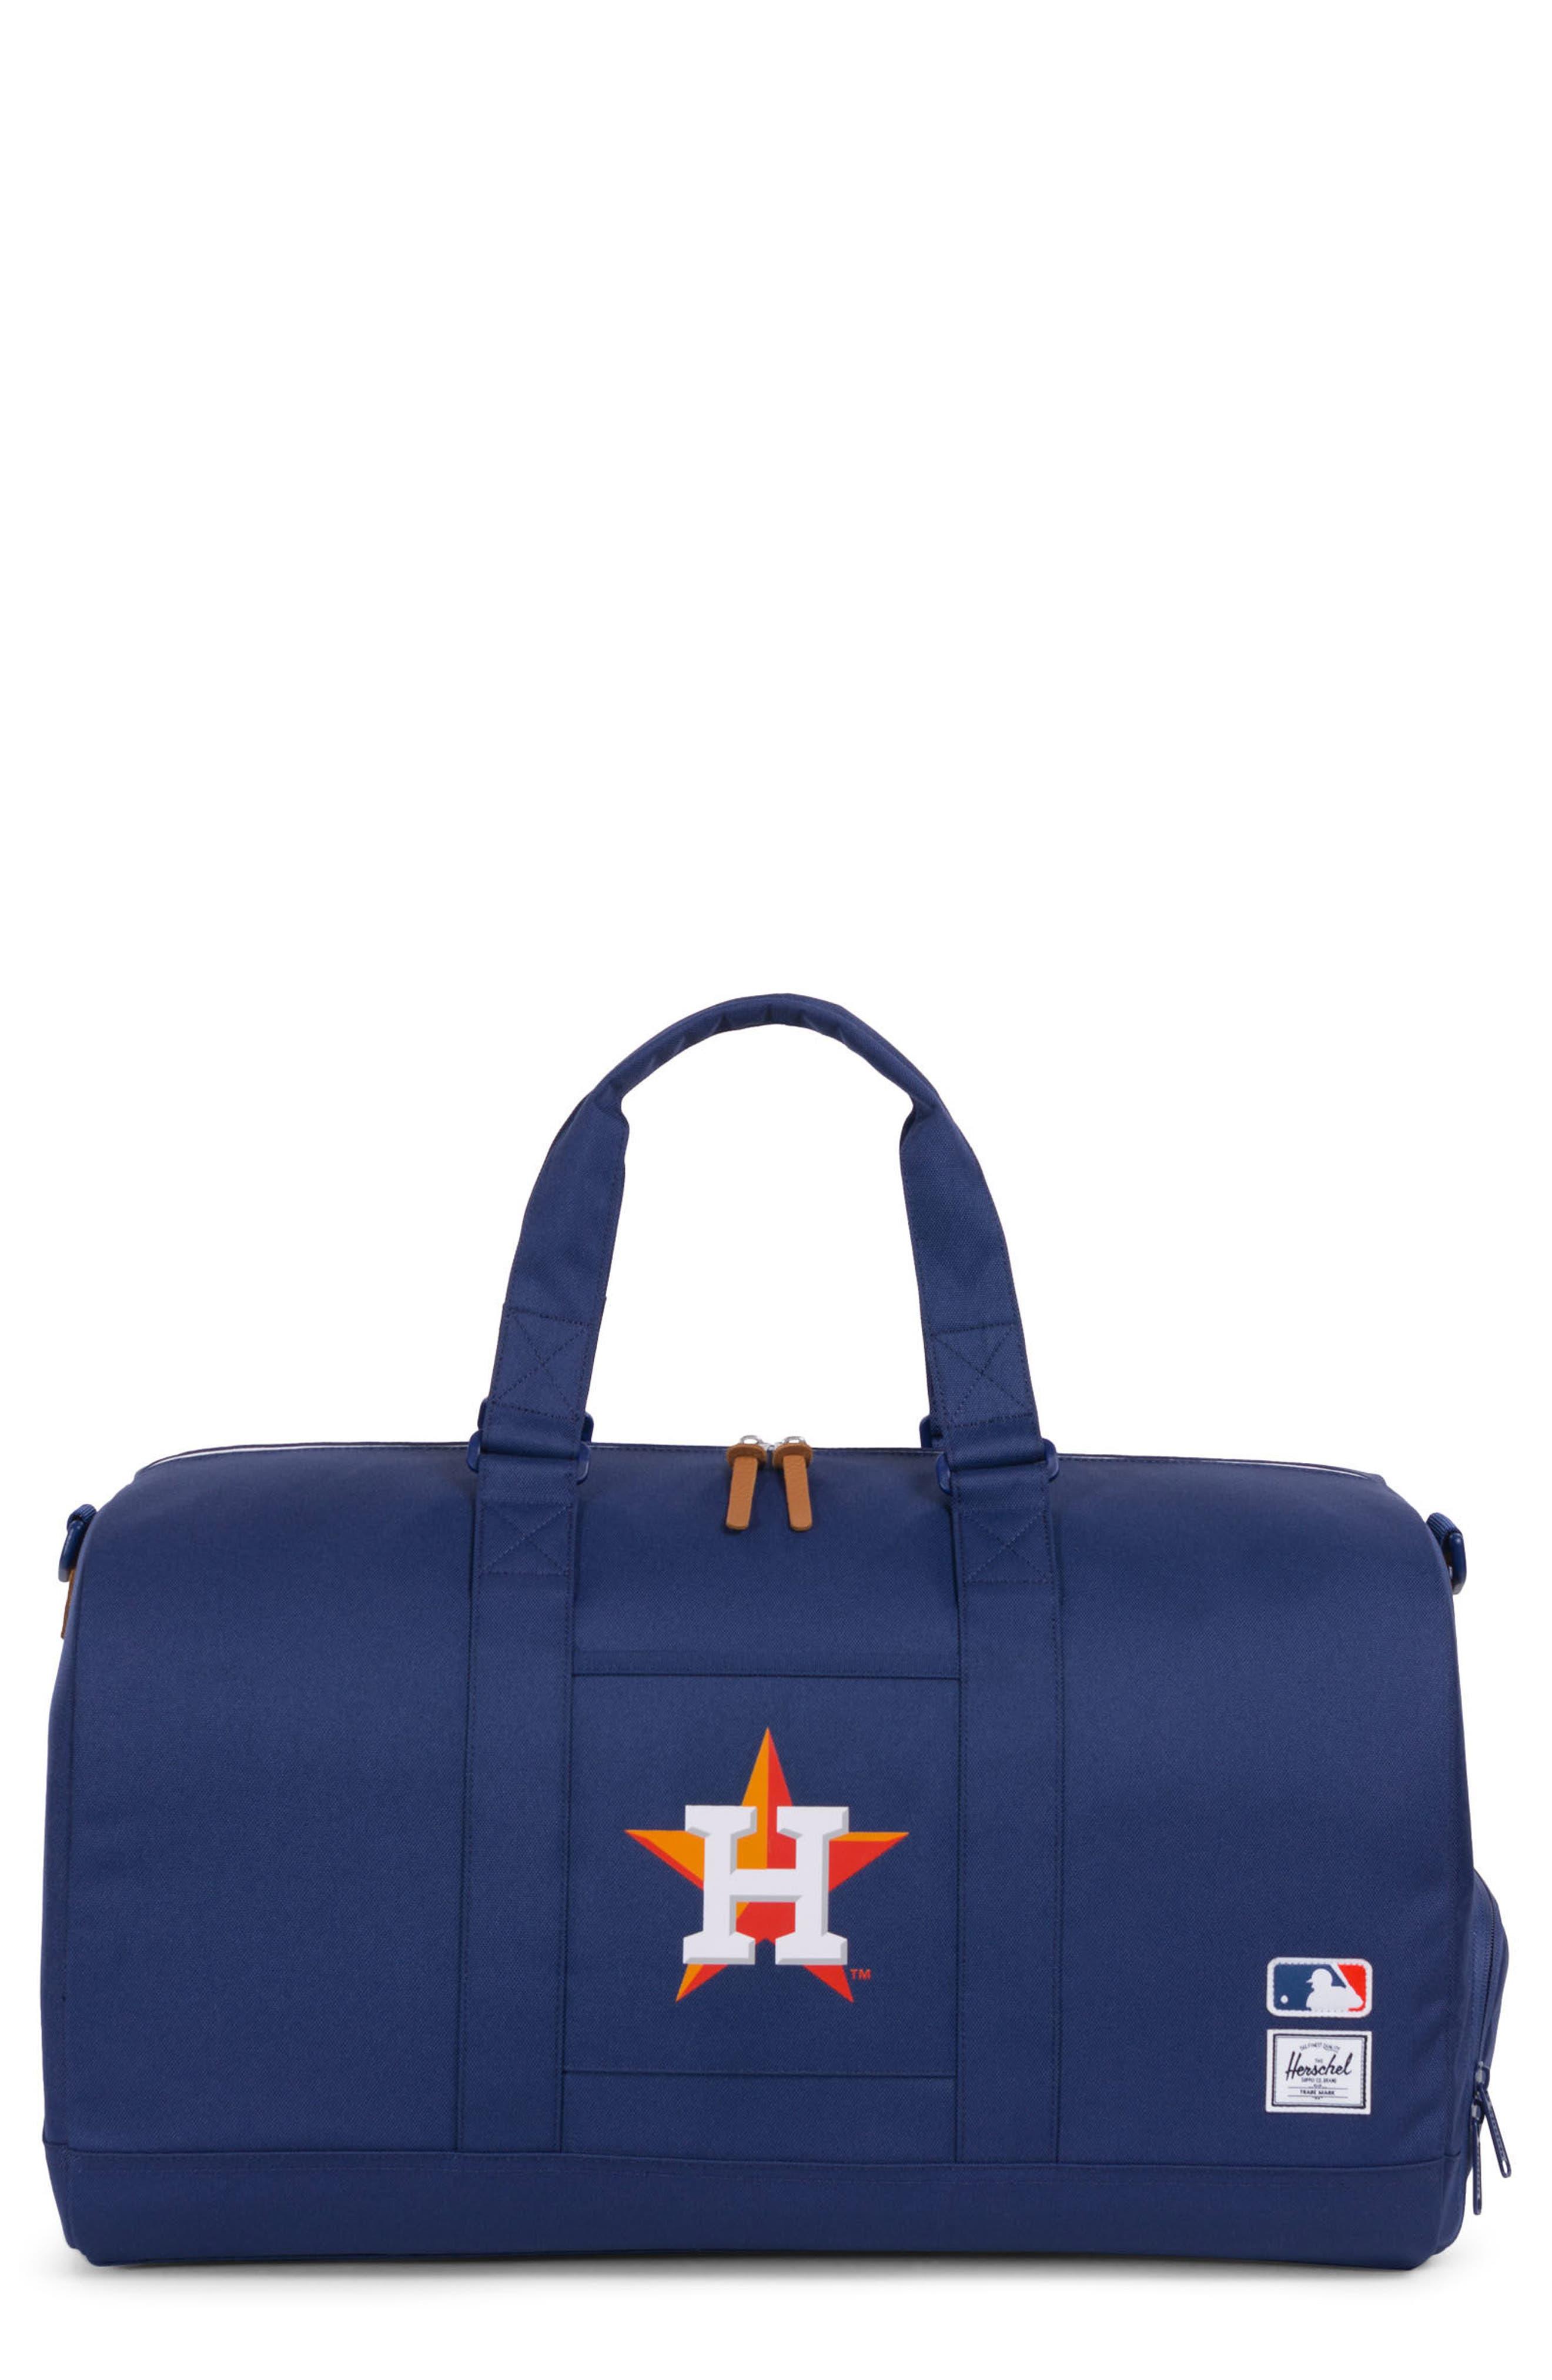 Alternate Image 1 Selected - Herschel Supply Co. Novel - MLB American League Duffel Bag